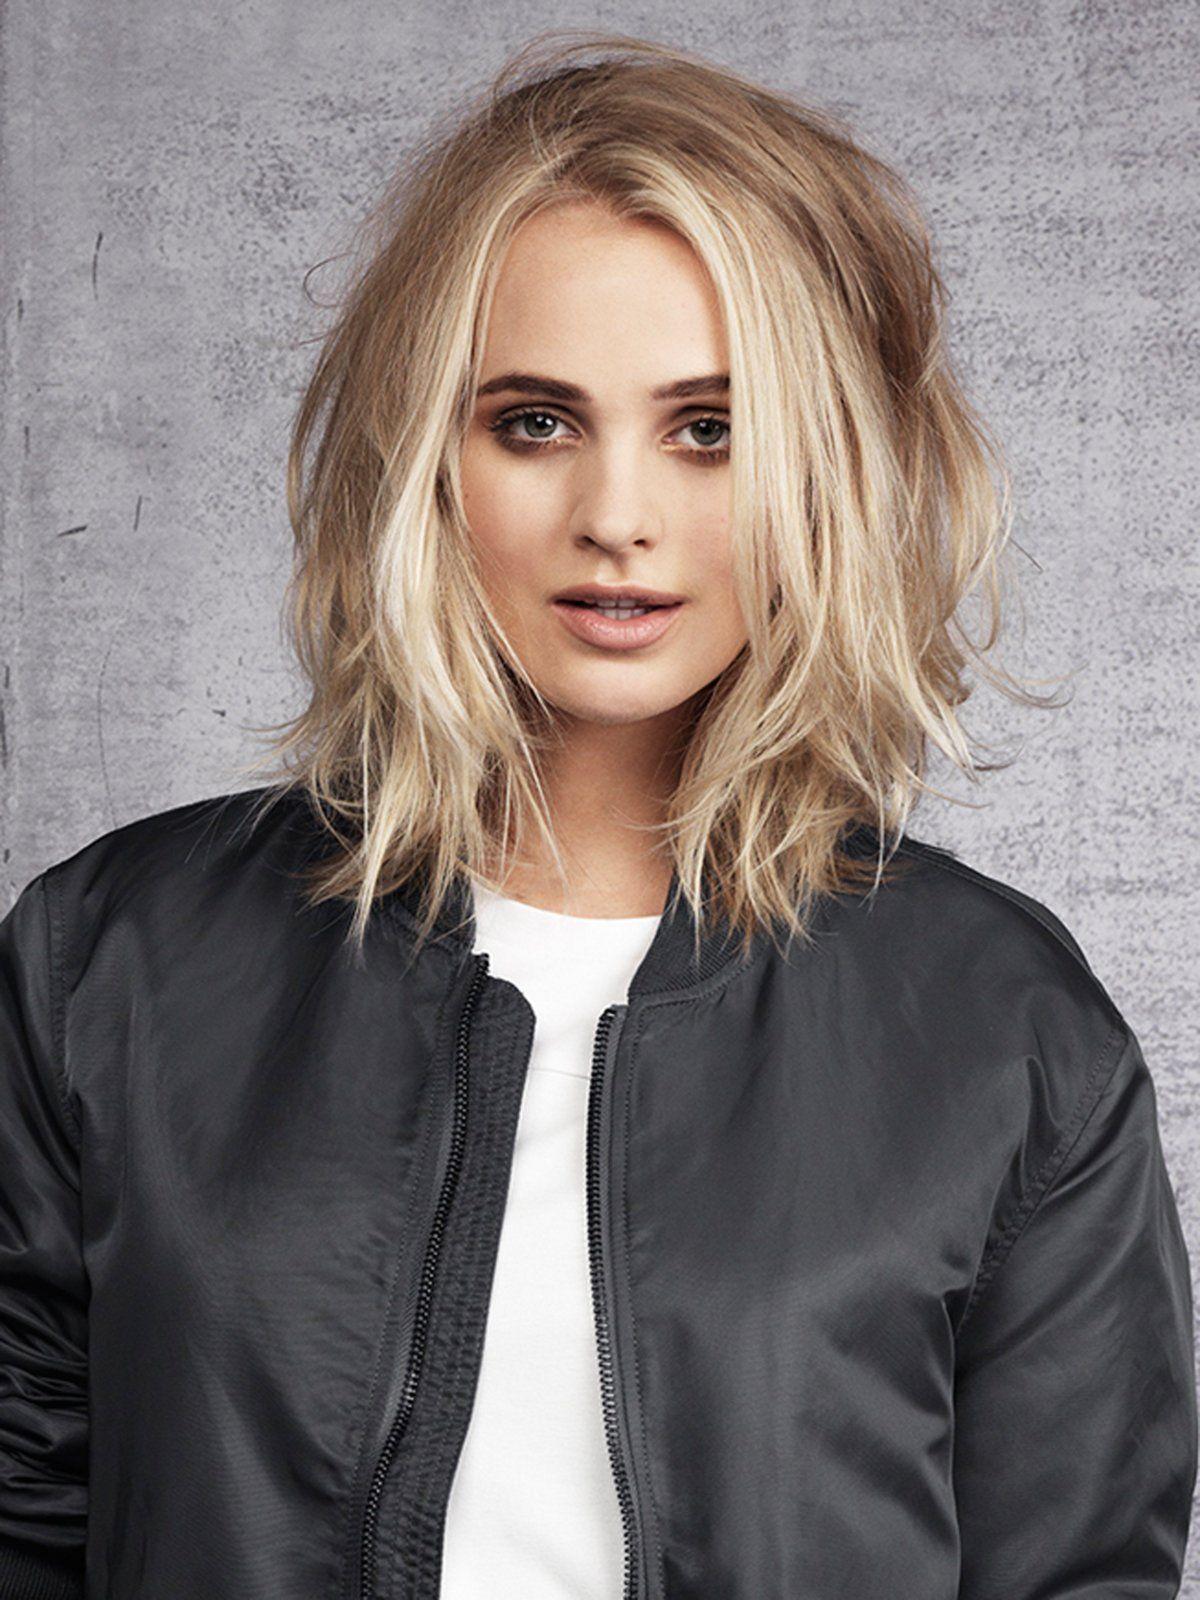 Mittellange Frisurentrends 2018 Haare Pinterest Bobs Haircuts